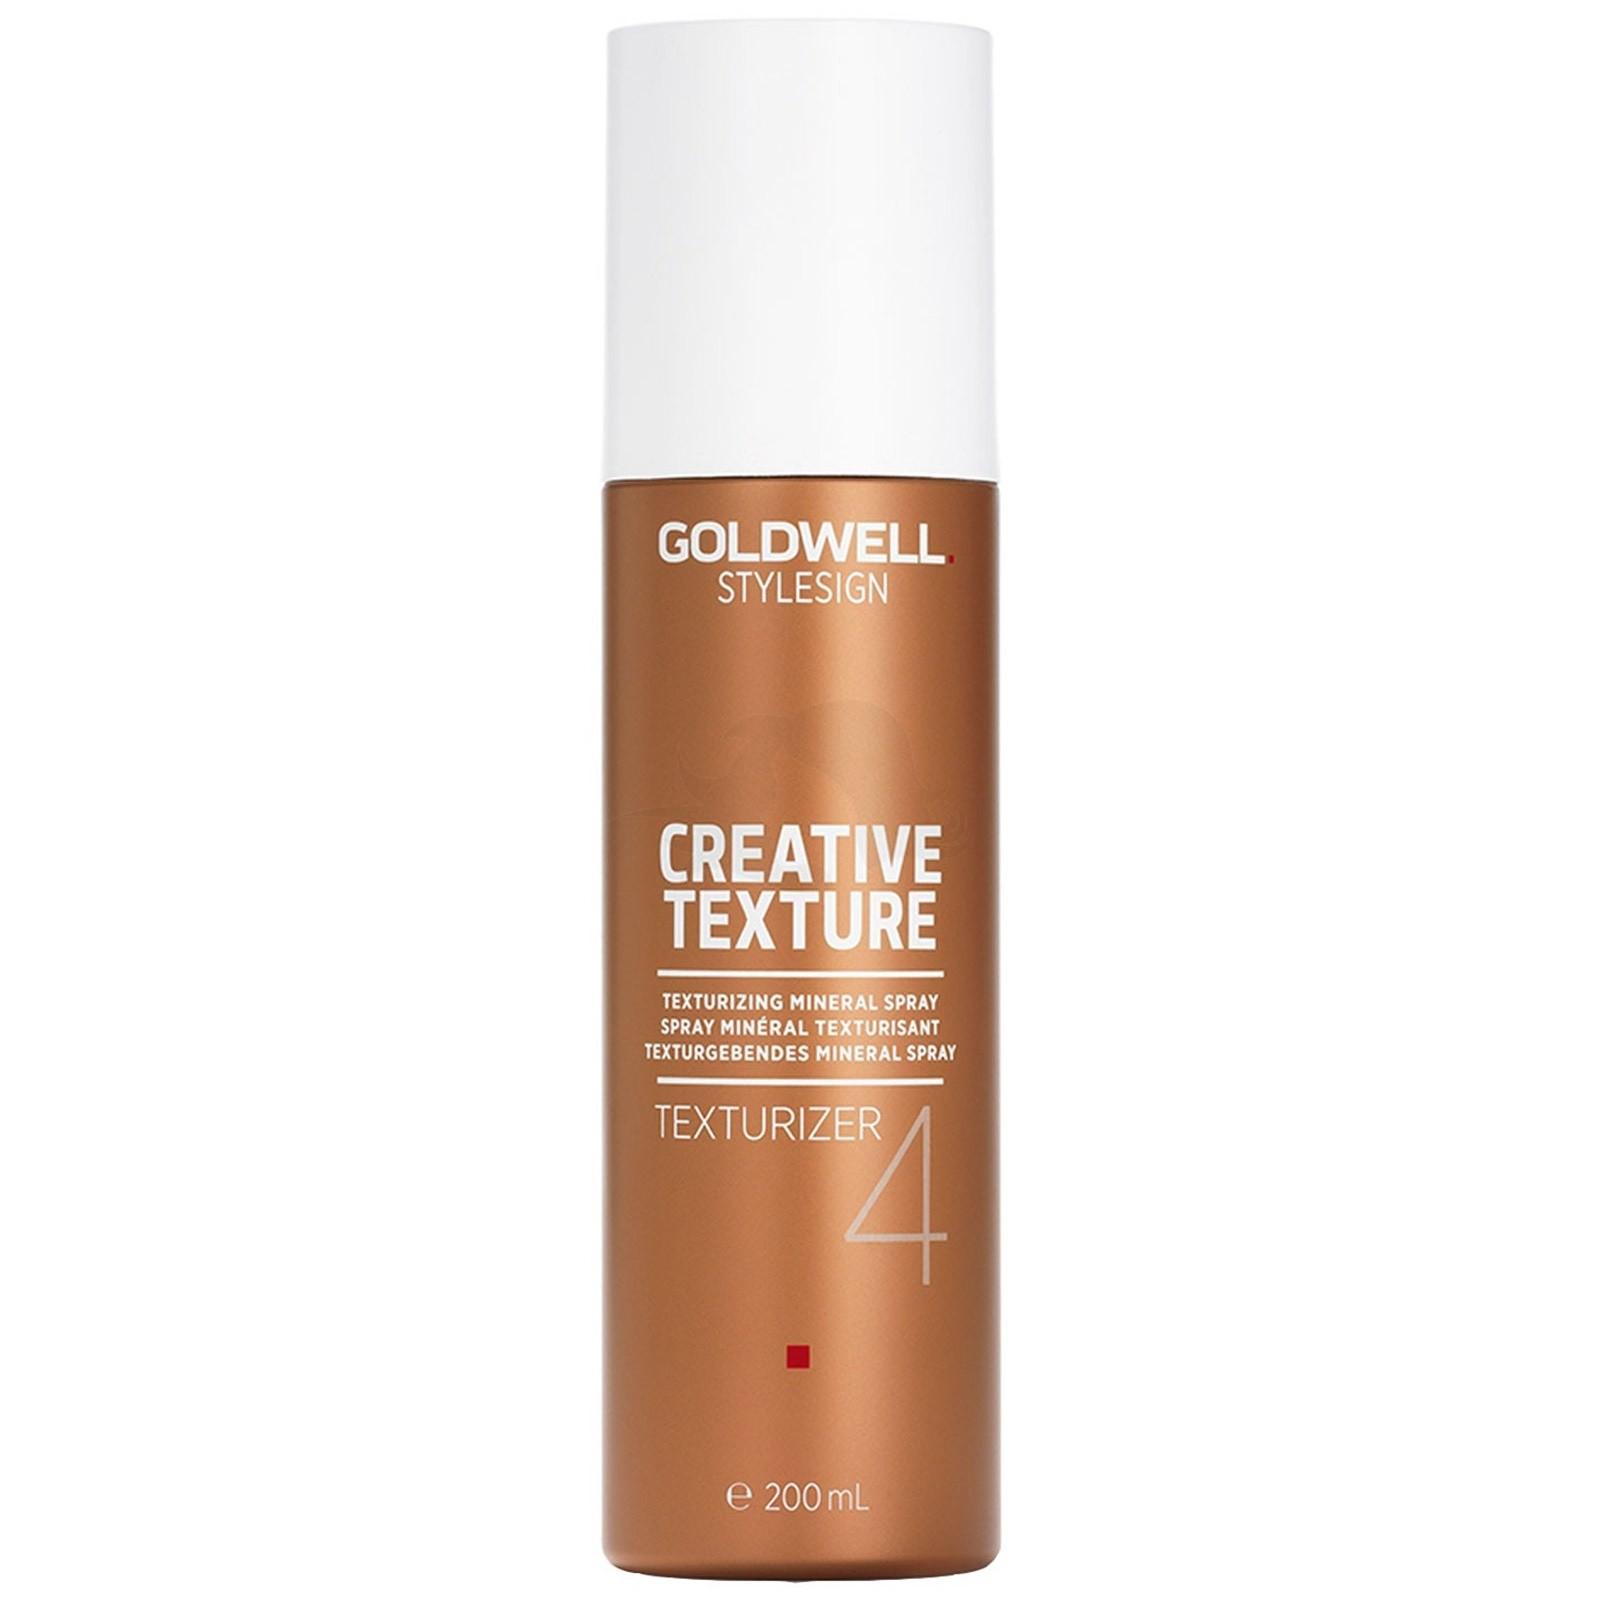 Goldwell Creative Texture Texturizer 200 ml